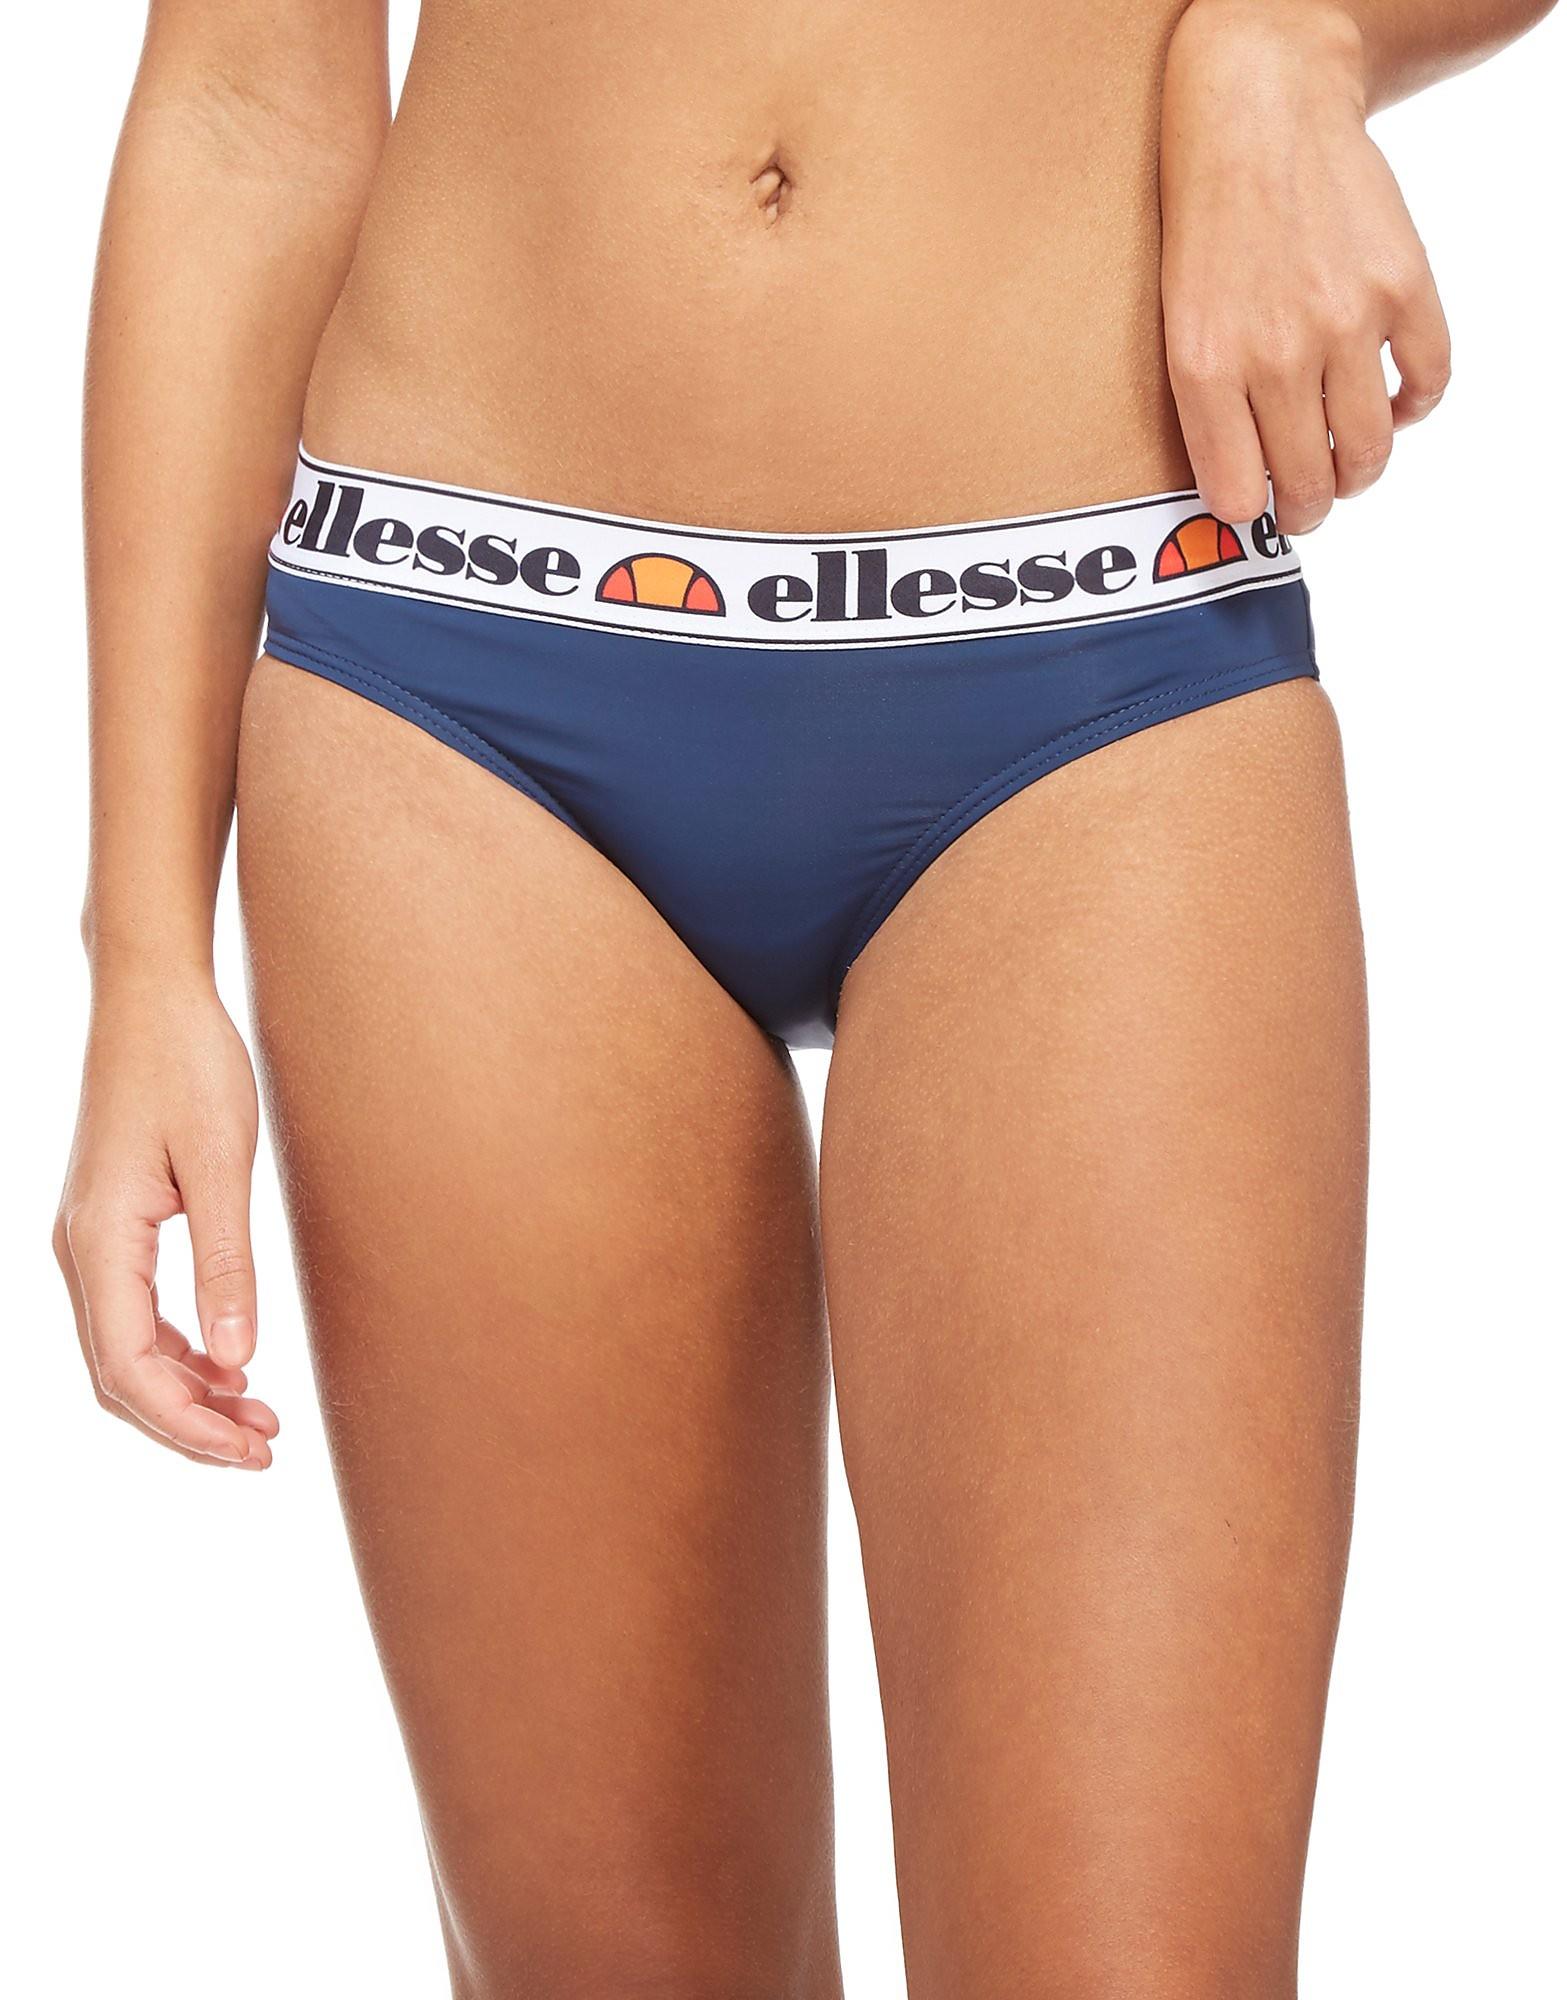 Ellesse Tape Bikini Briefs - Only at JD - Navy, Navy